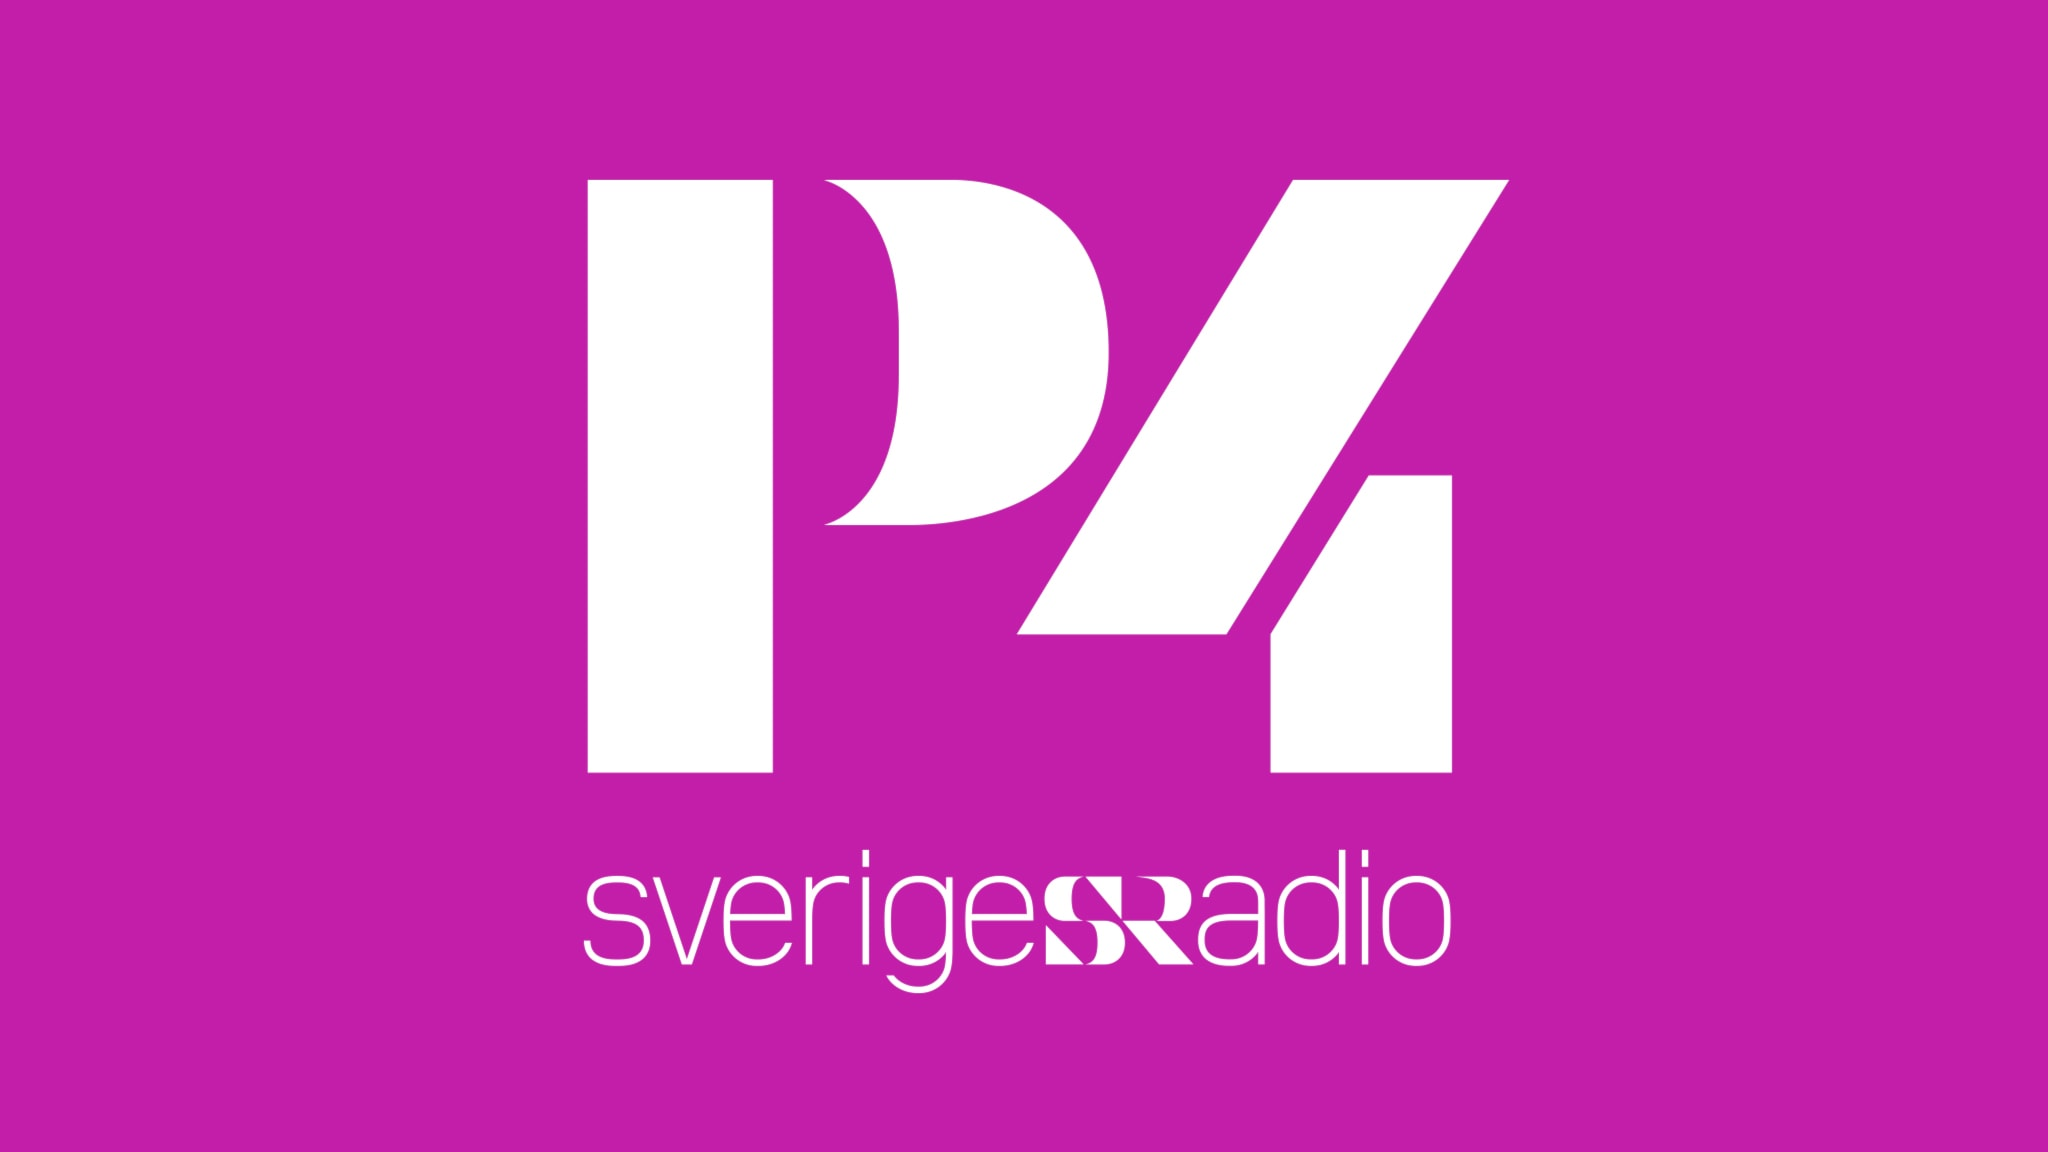 Trafik P4 Göteborg 20191216 05.20 (00.30) - spela